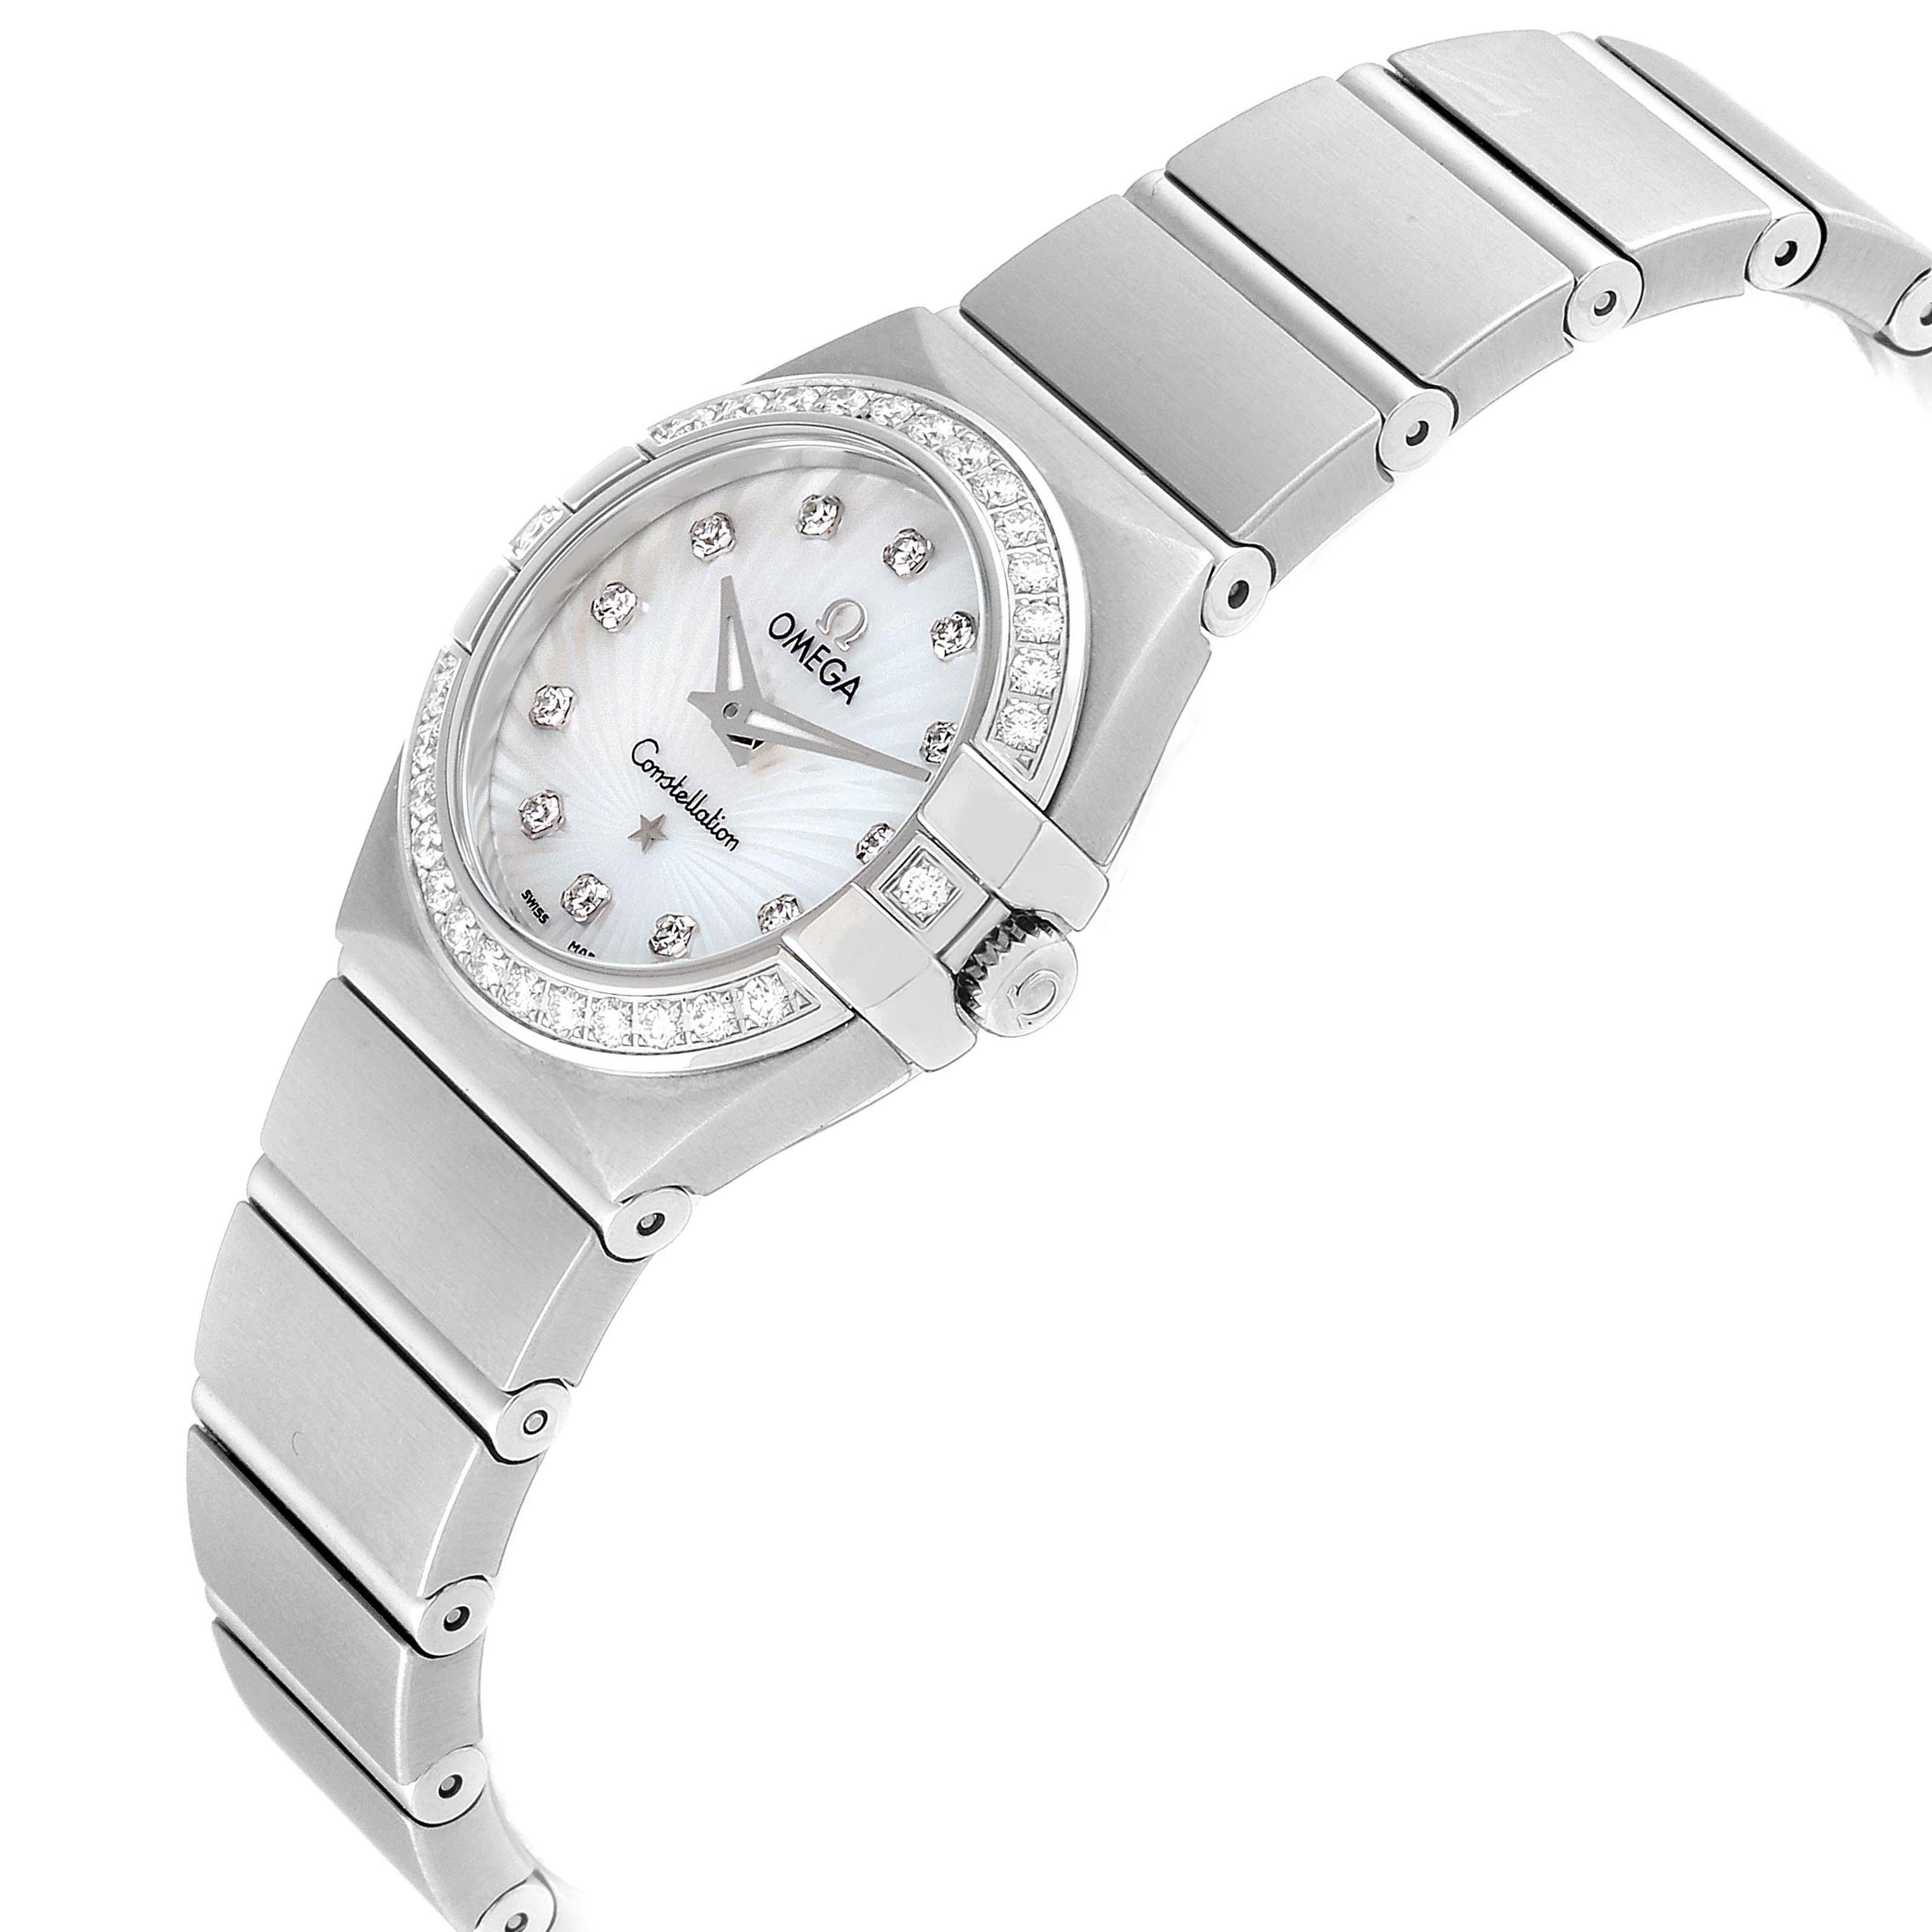 Omega Constellation 24 MOP Diamond Watch 123.15.24.60.55.004 Unworn SwissWatchExpo